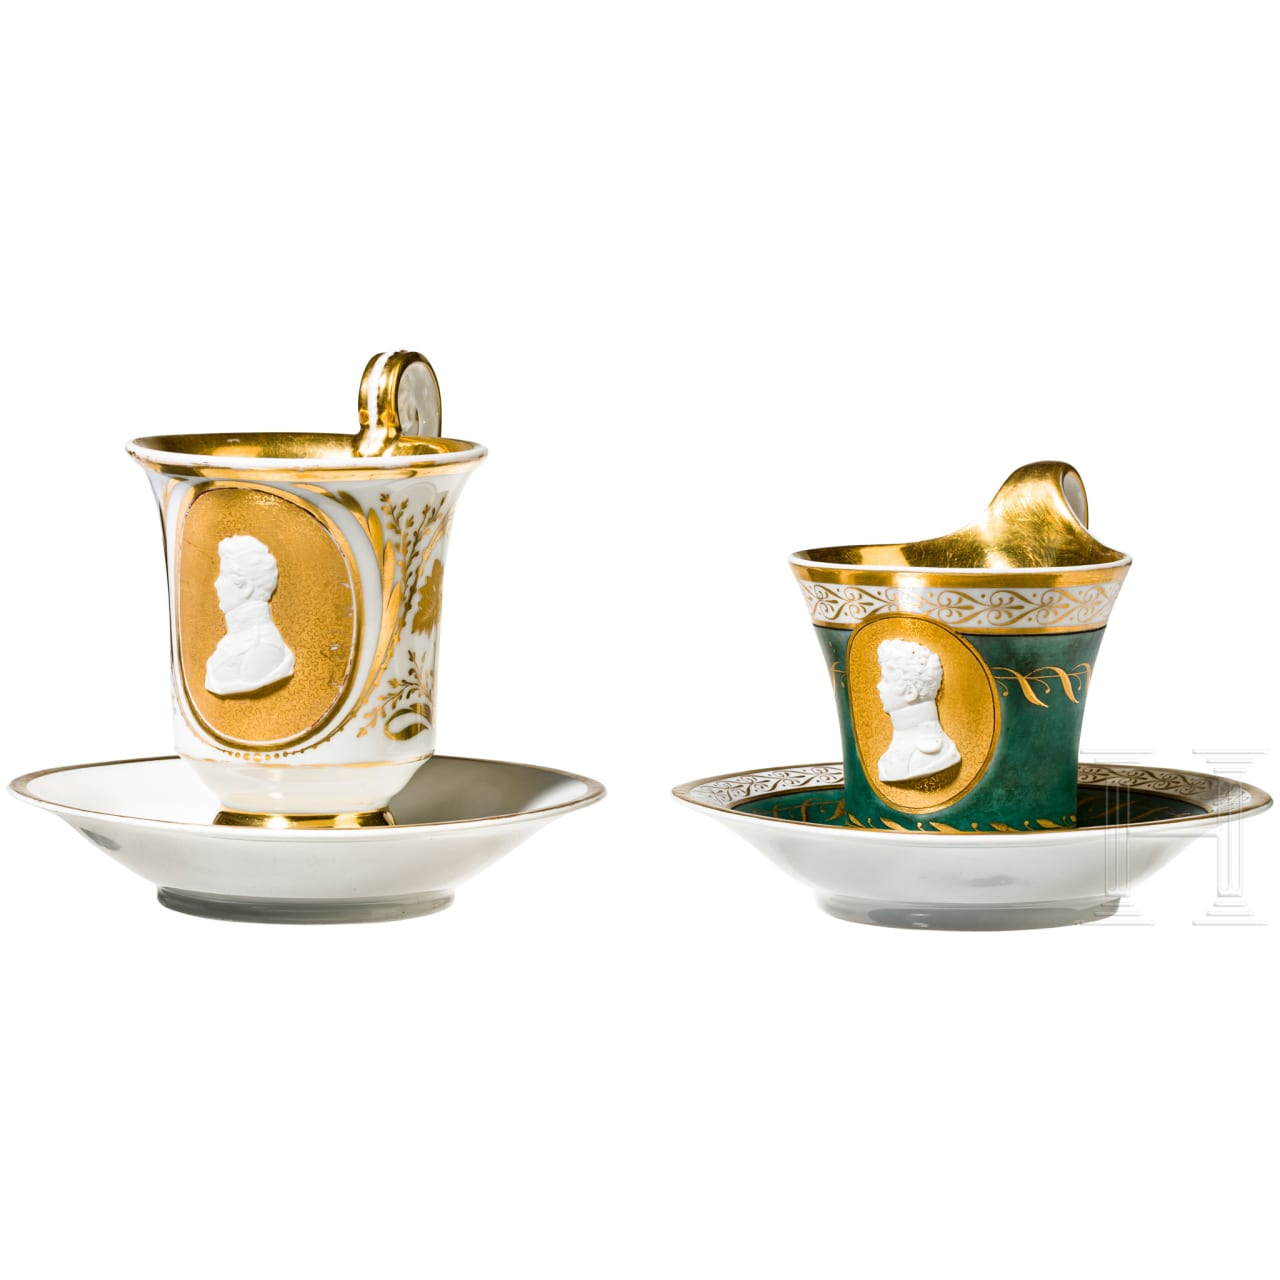 Friedrich Wilhelm IV as crown prince - two KPM cups, c. 1813